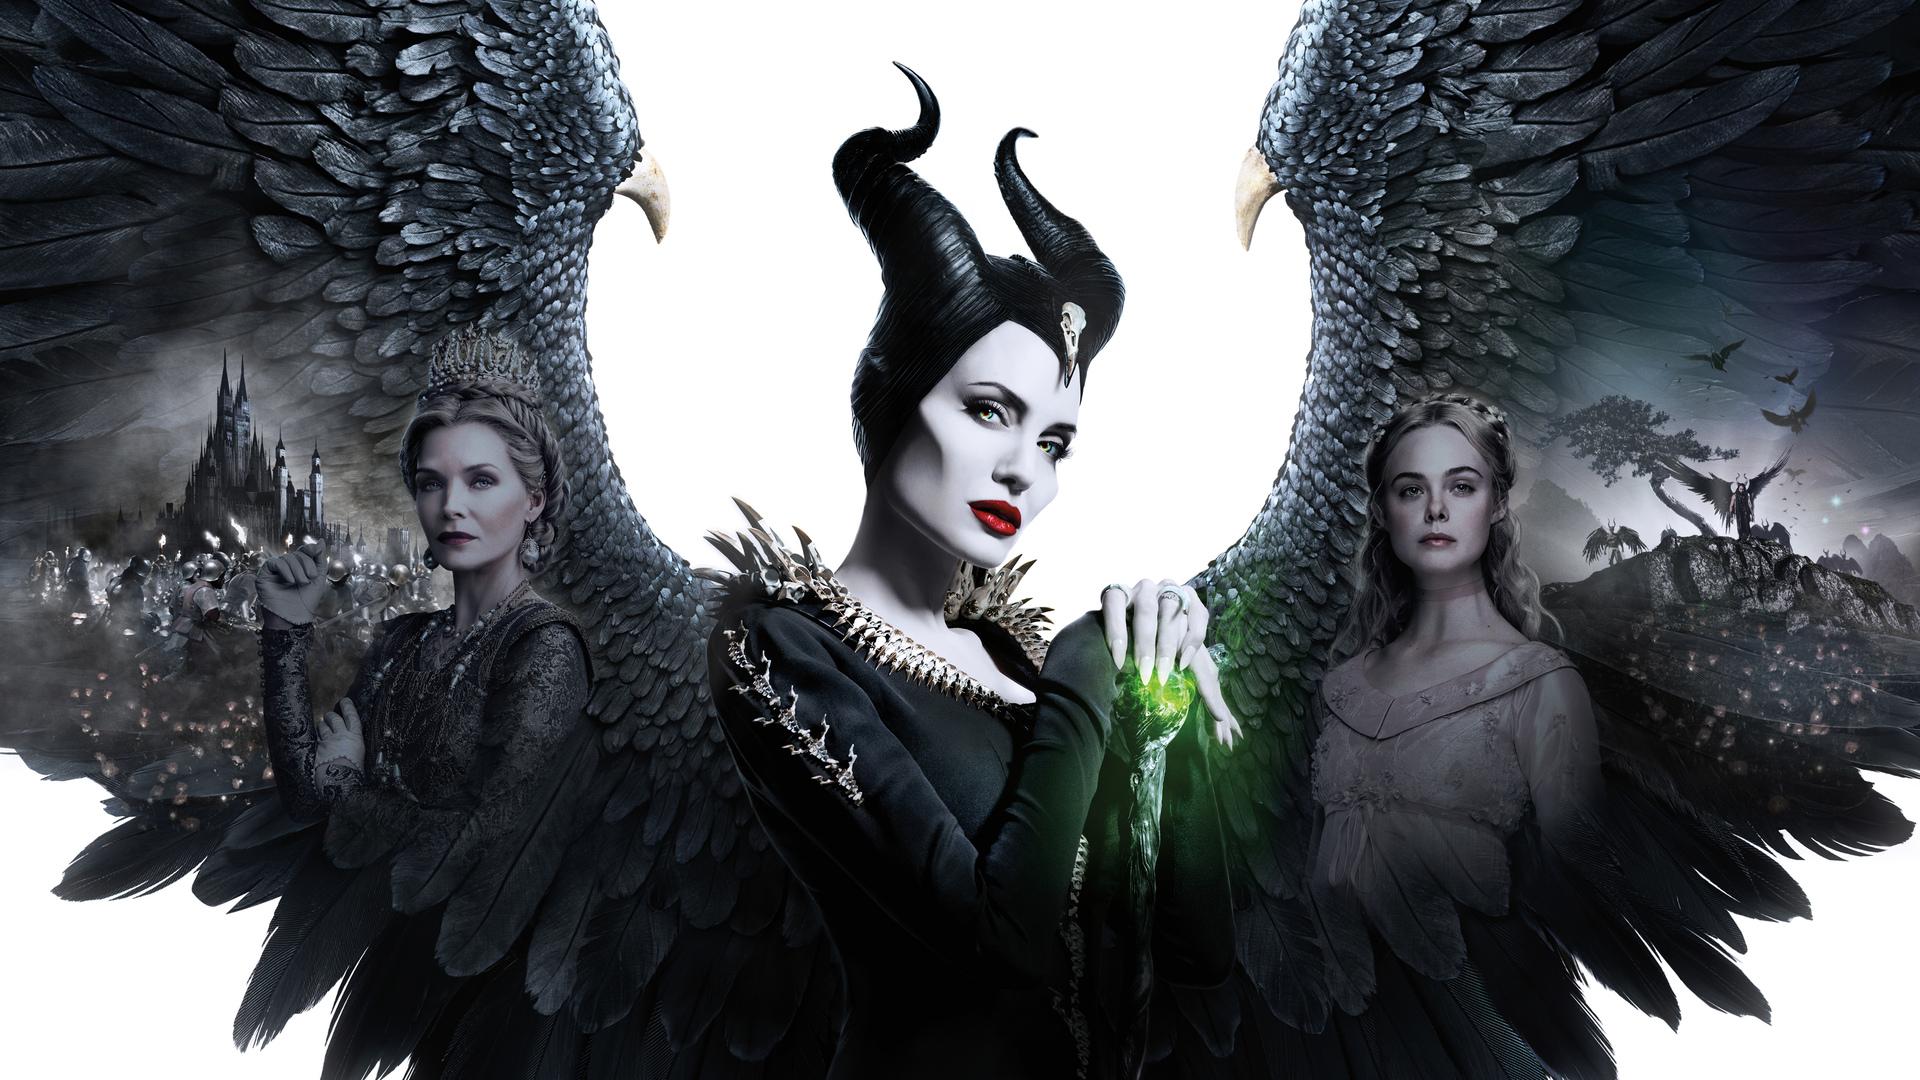 1920x1080 Maleficent Mistress Of Evil 5k 2019 Poster Laptop